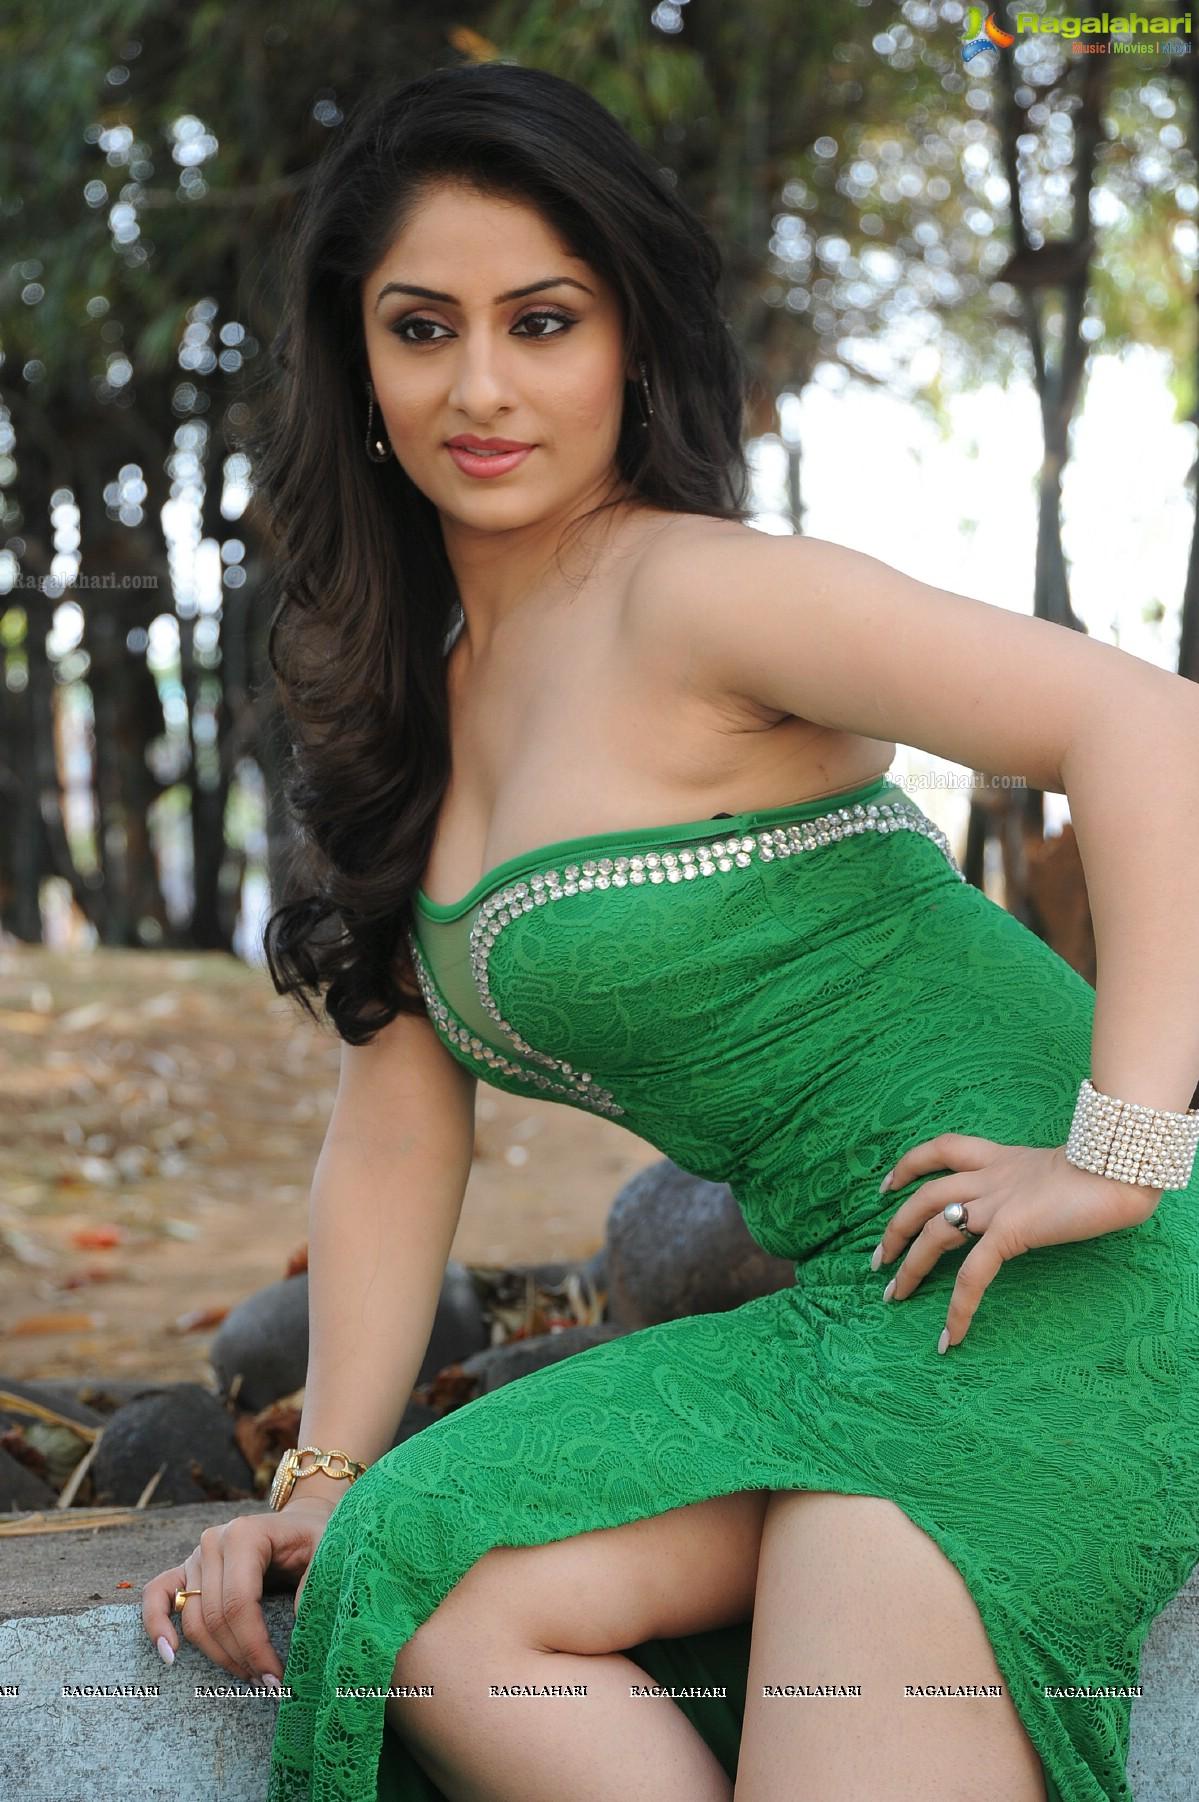 Sexy Ankita Sharma nudes (71 photo) Pussy, Instagram, cleavage